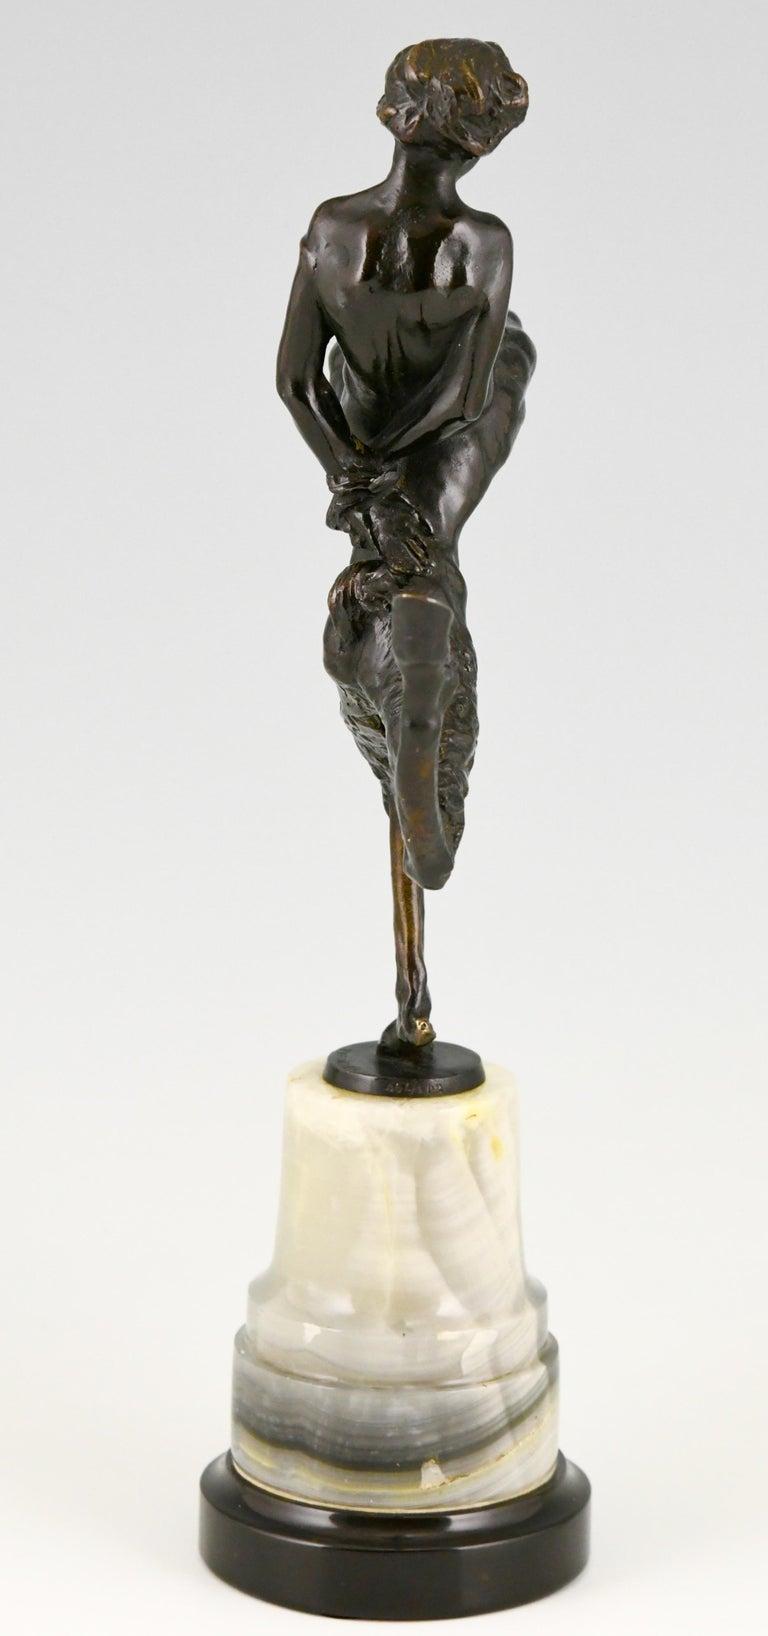 Art Nouveau Bronze Sculpture Satyr and Nude Hans Piffrader, ca. 1900 For Sale 2